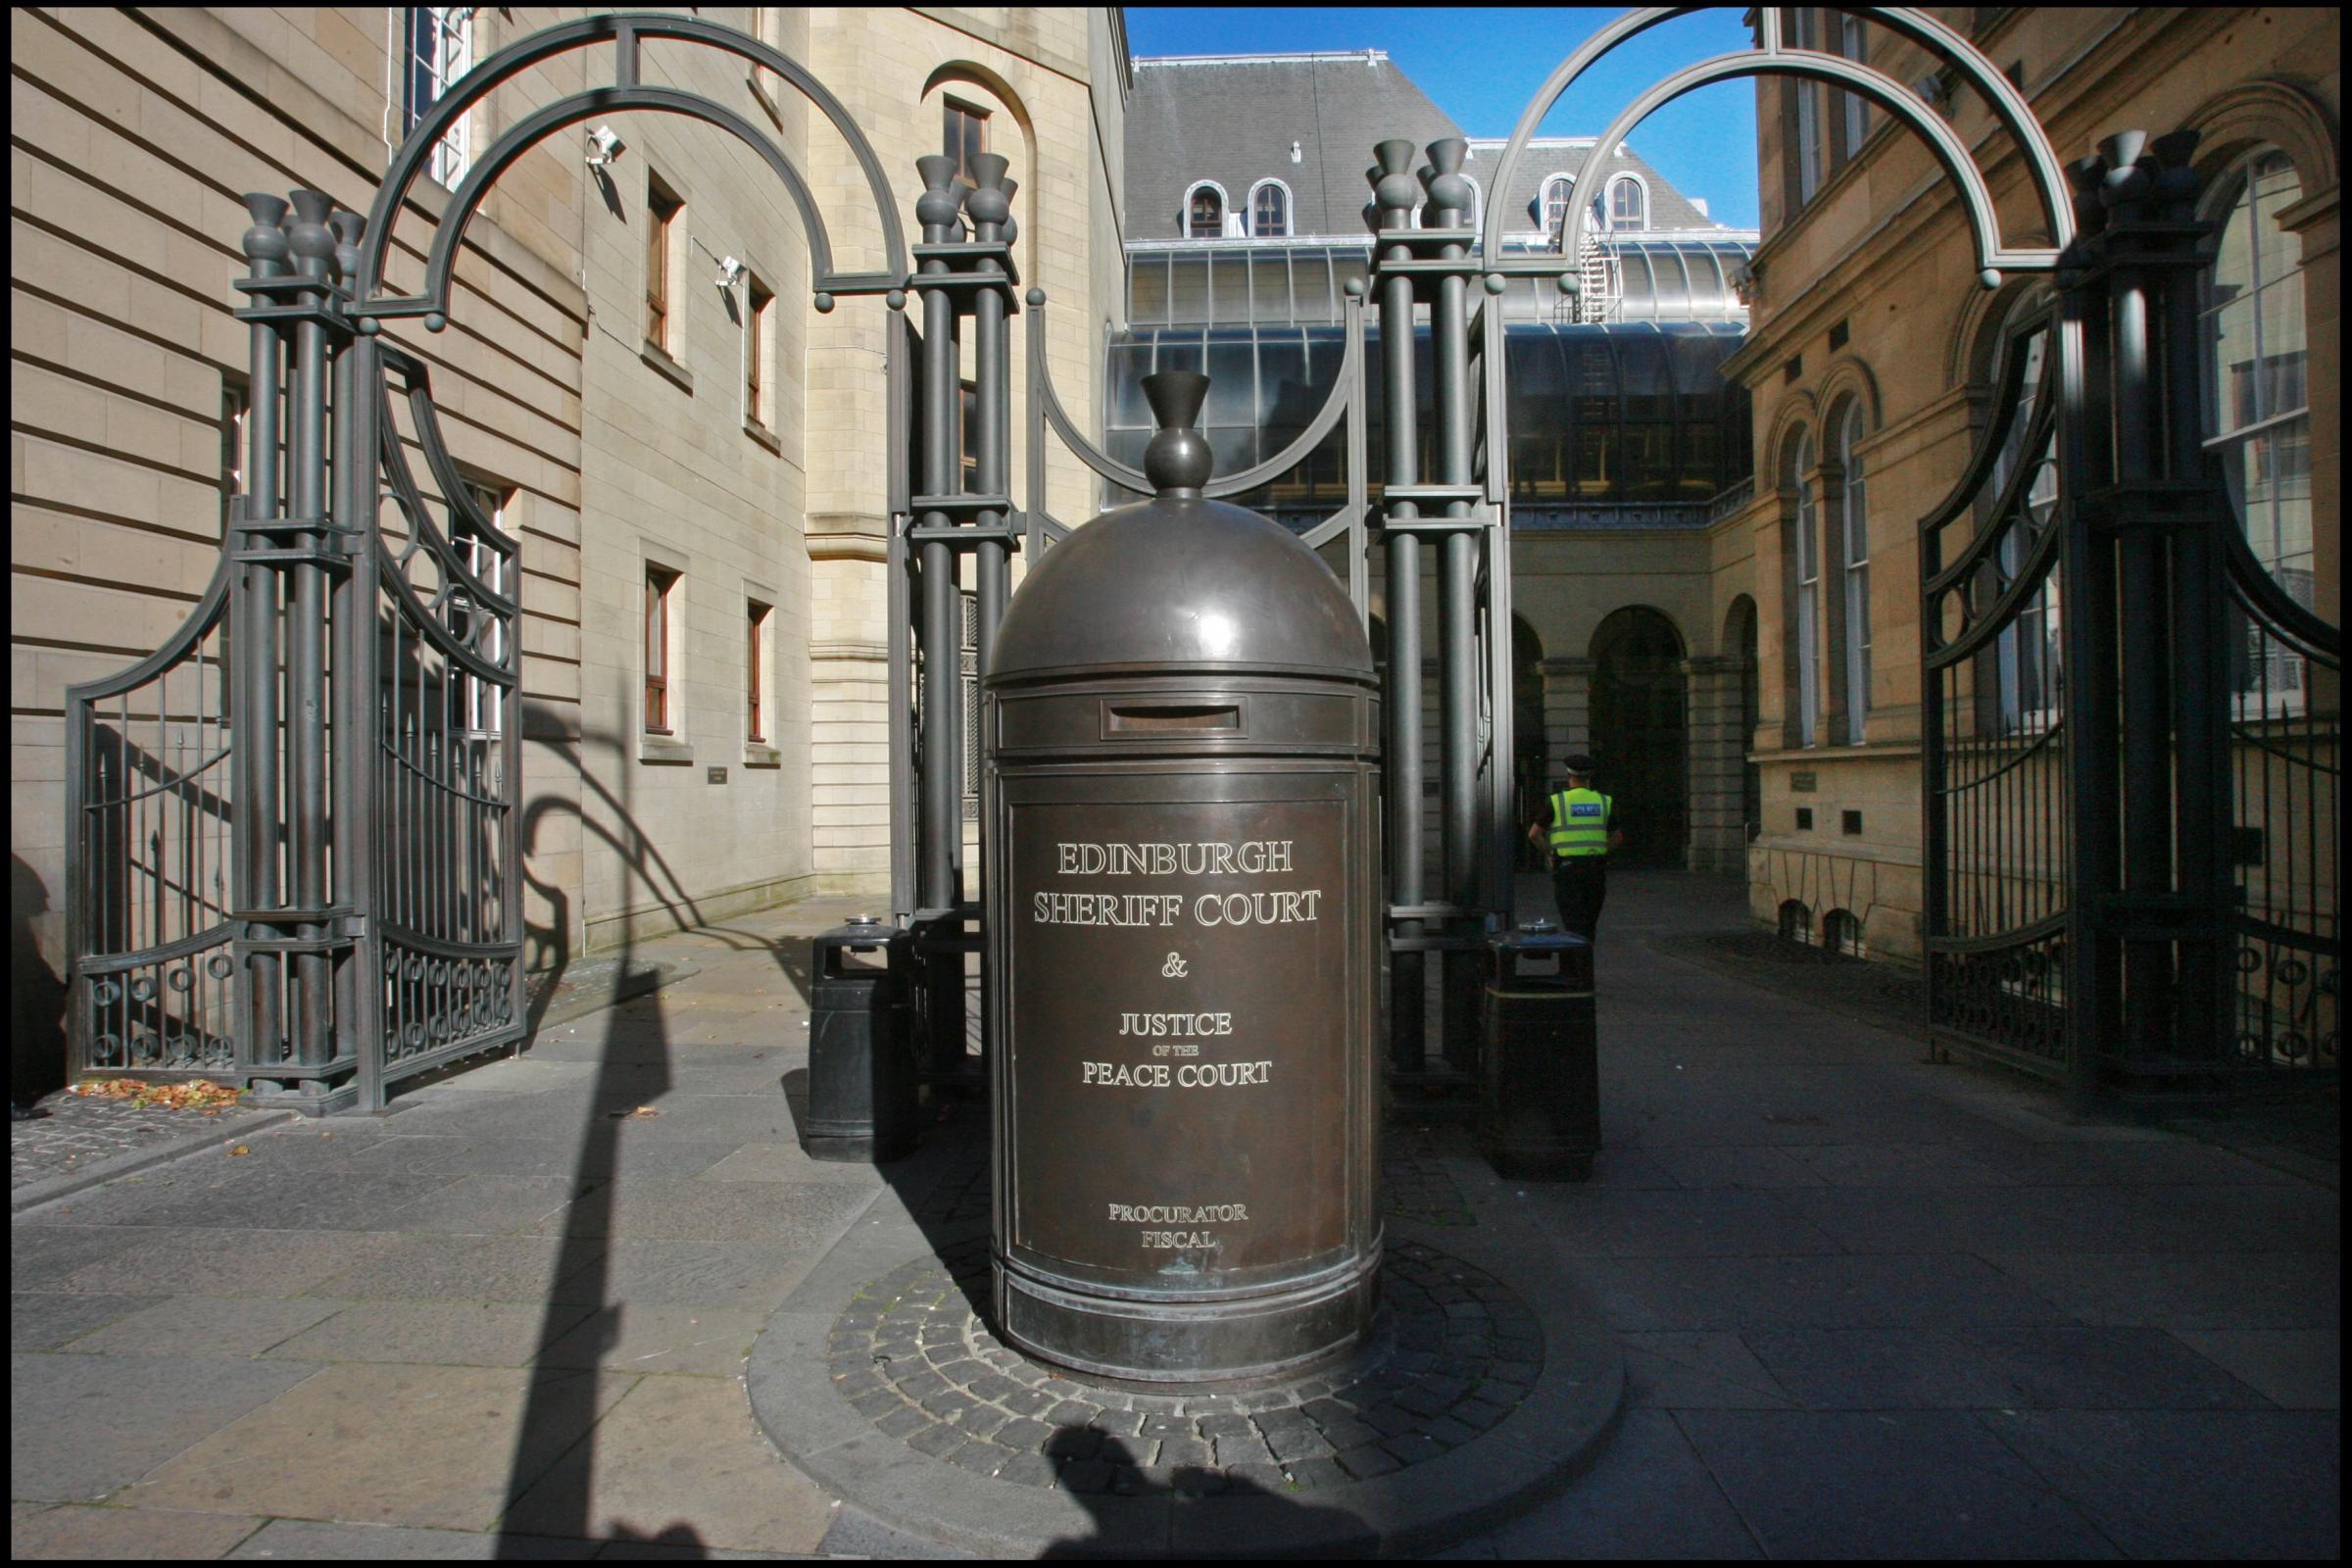 Edinburgh lawyers make further cutbacks to legal aid workloads